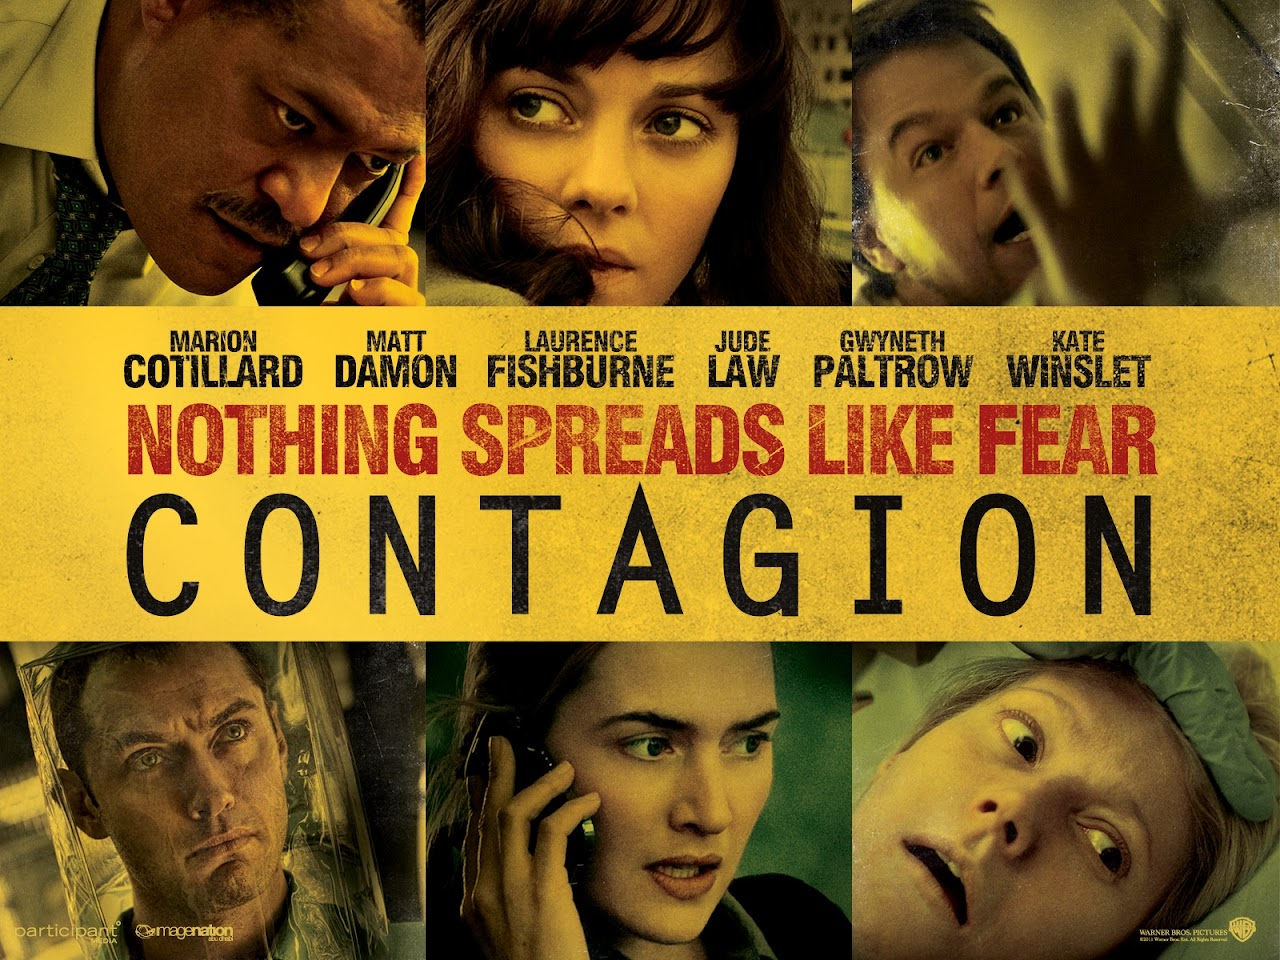 http://3.bp.blogspot.com/-HVjWfePkI3w/Tz34dEhbj7I/AAAAAAAACVk/kM_y7KIW_i0/s1280/Contagion-movies-wallpaper.jpg